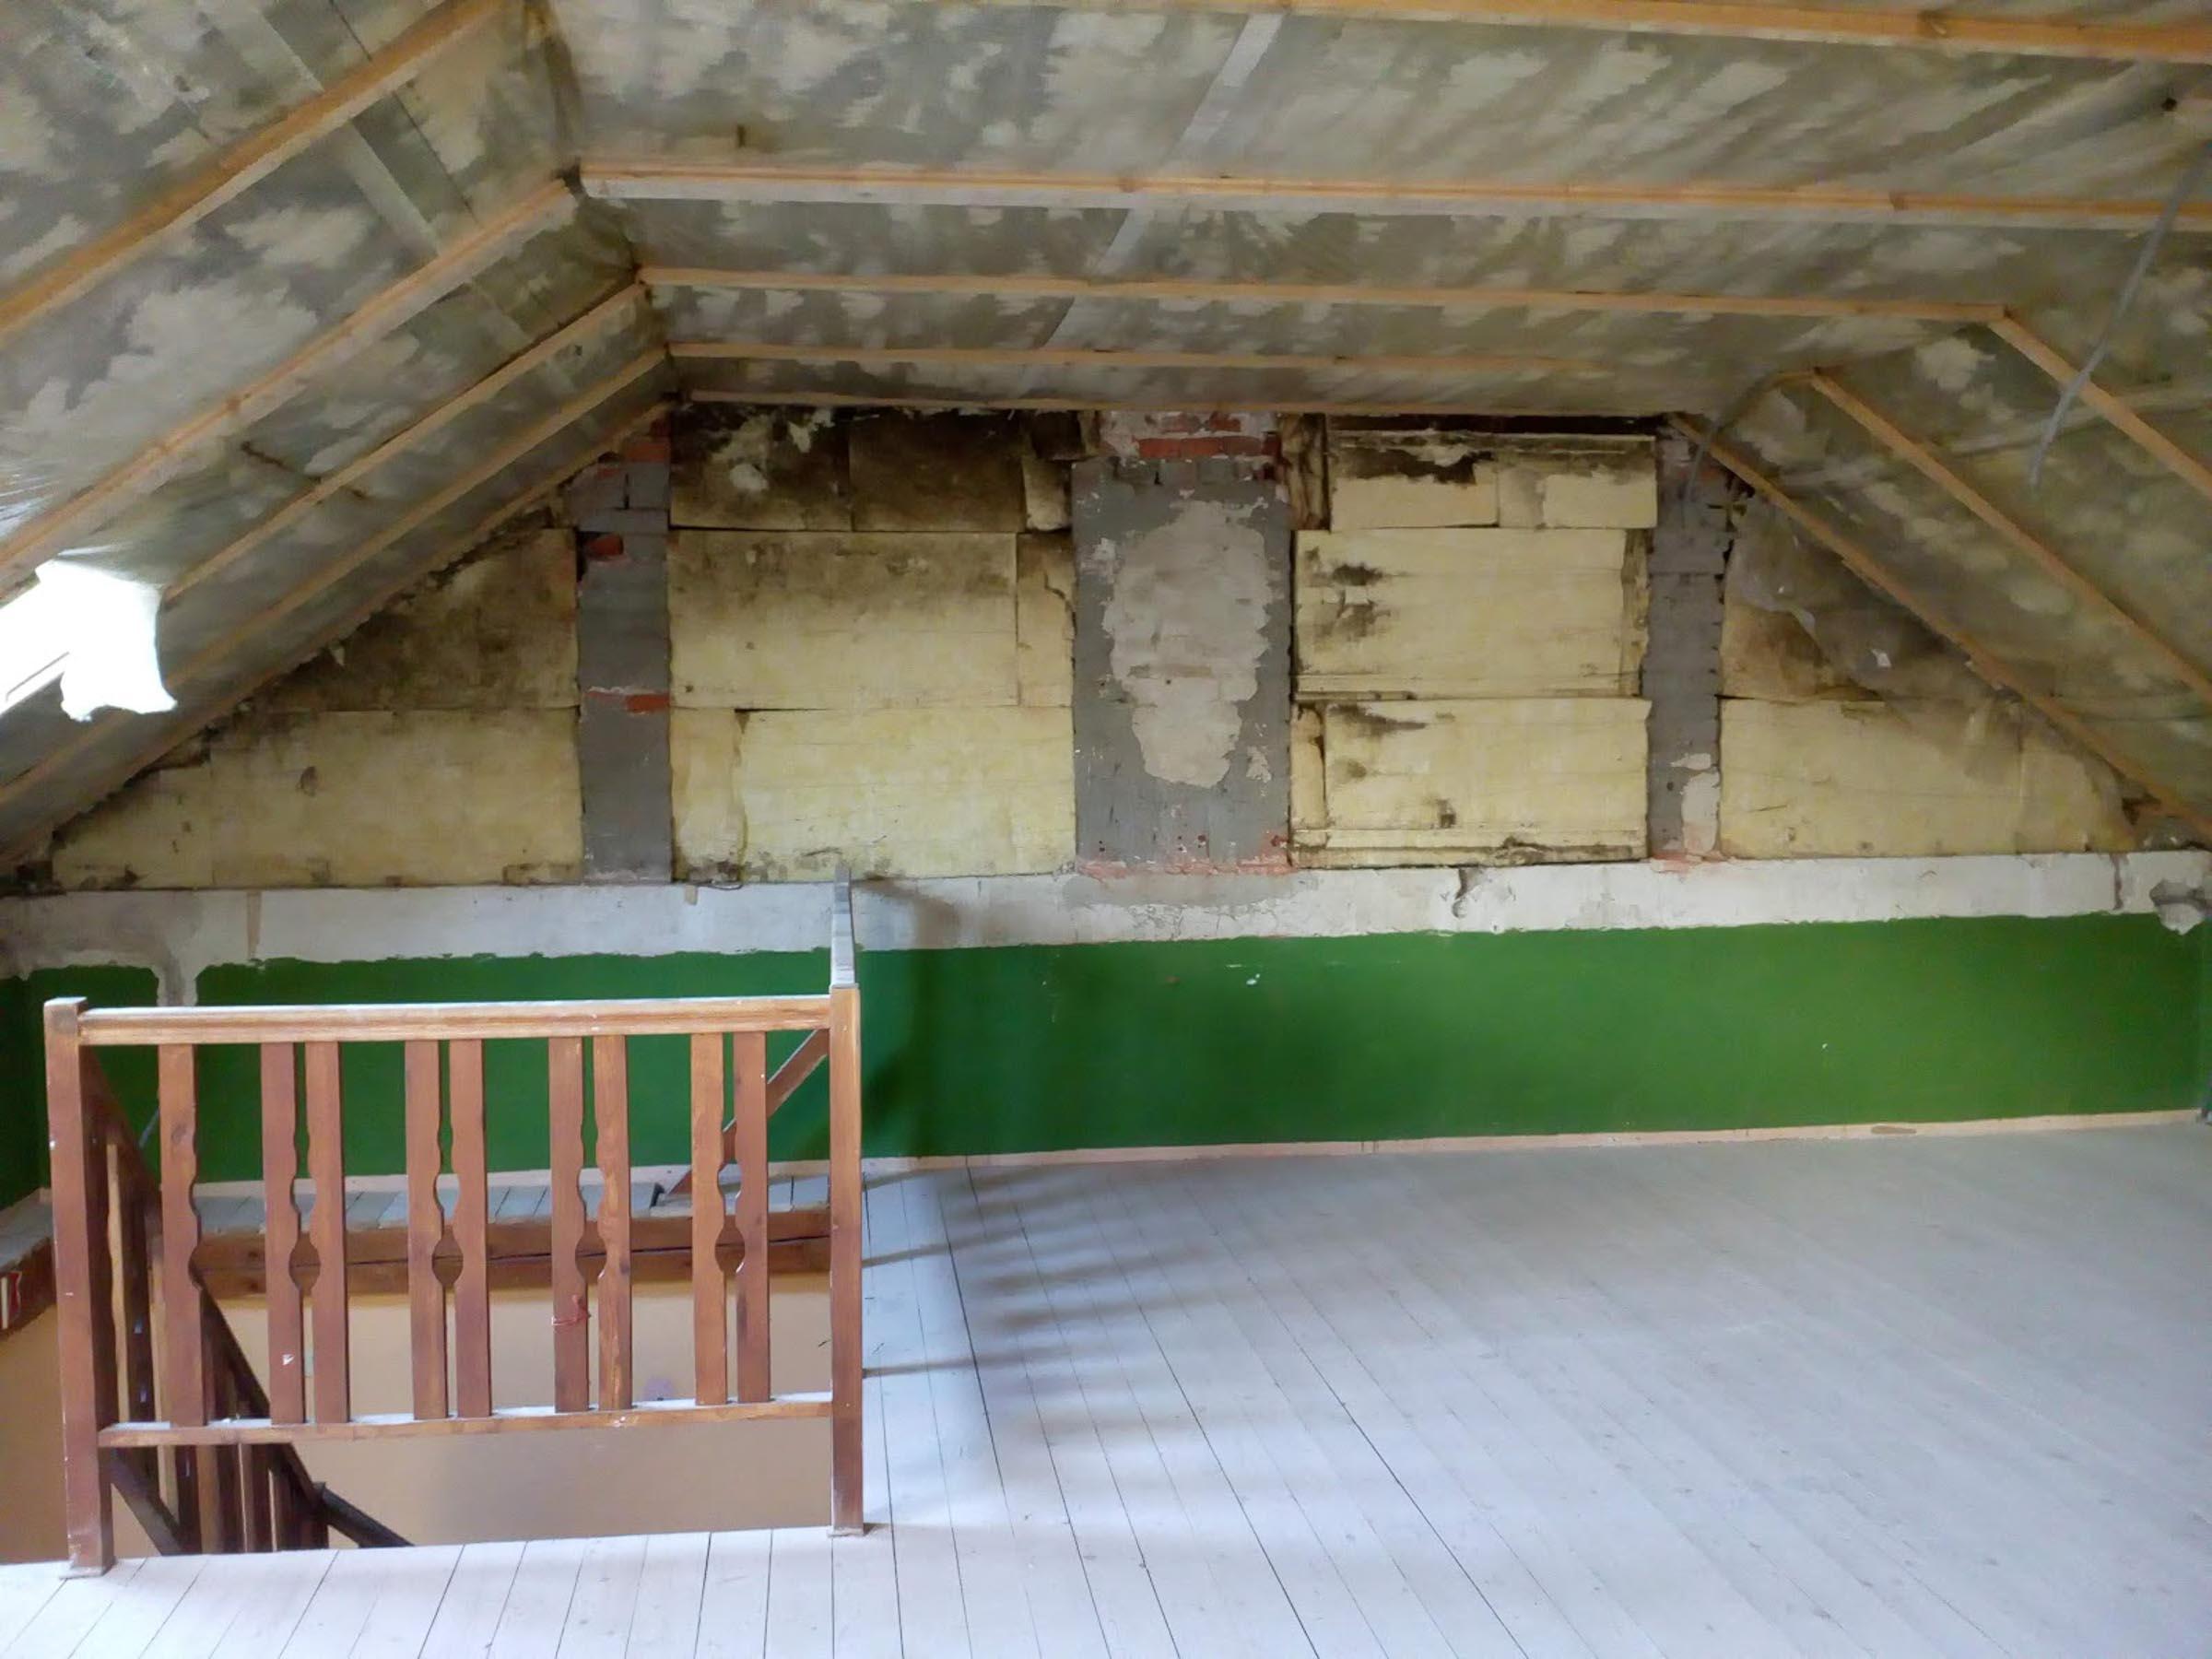 Rekonstrukcia a pristavba kaviarne, podkrovie povodne, VAUarchitects